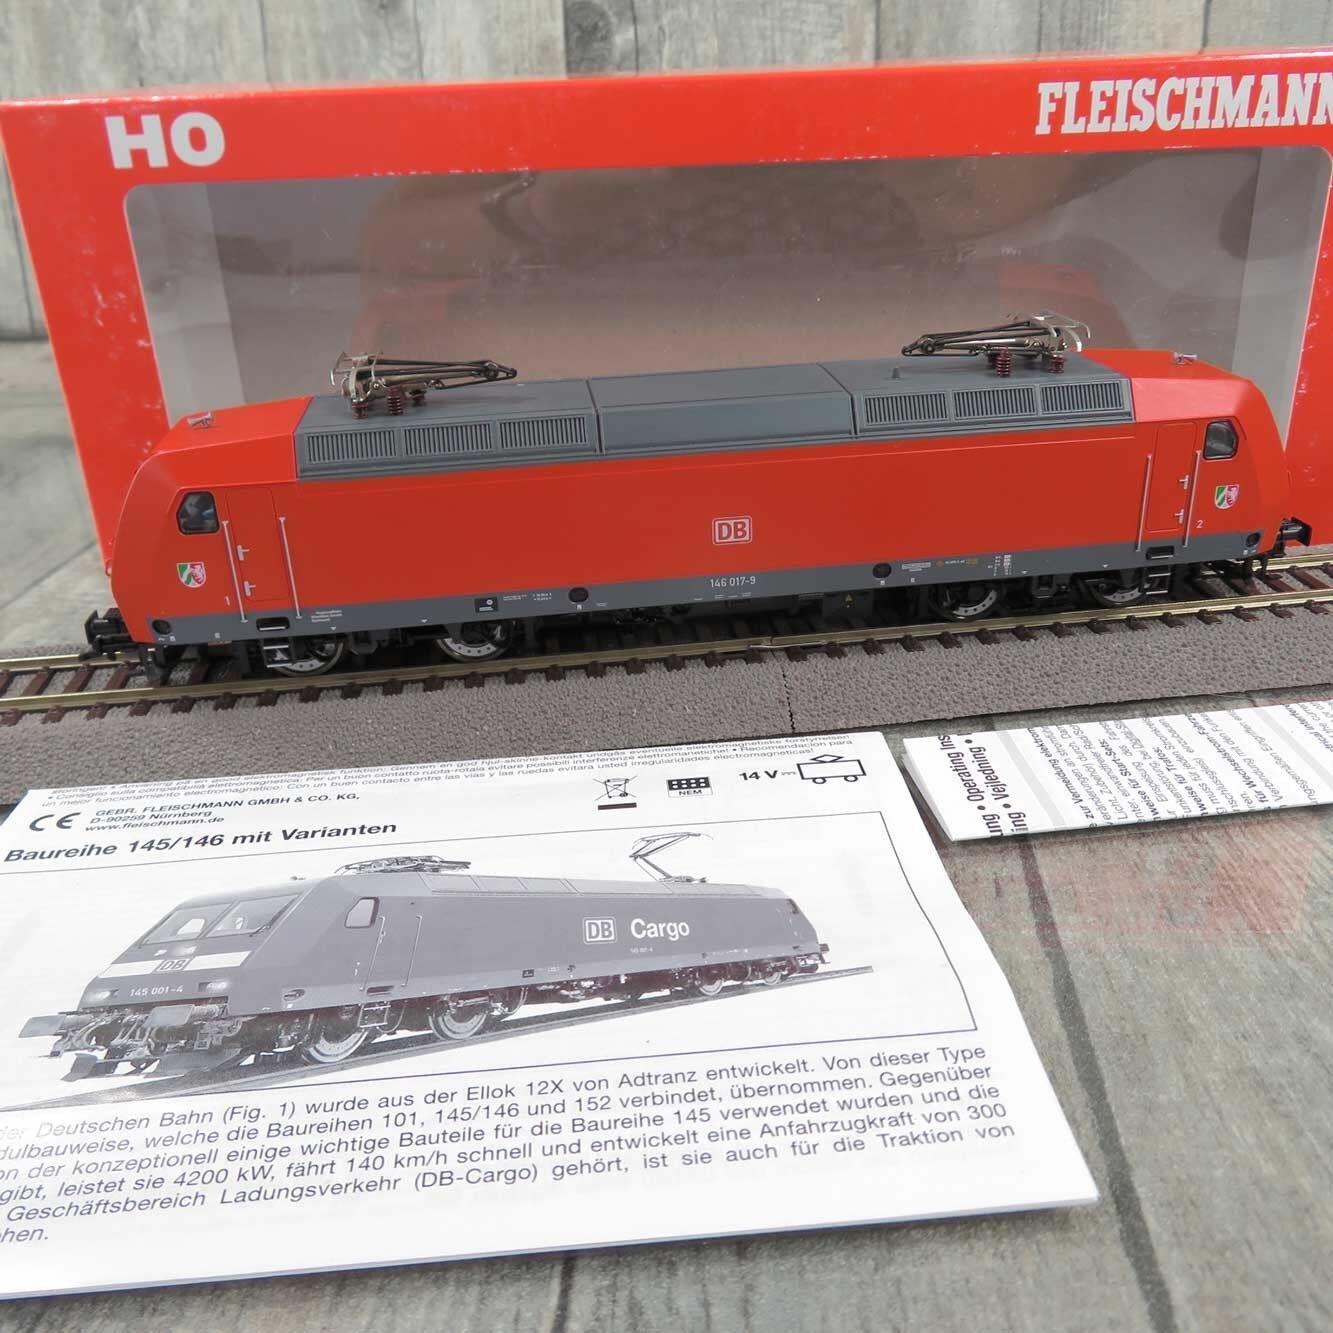 FLEISCHMANN 482410 - HO - DB - E-Lokomotive 146 017-9 - mit DSS - OVP -  R27580